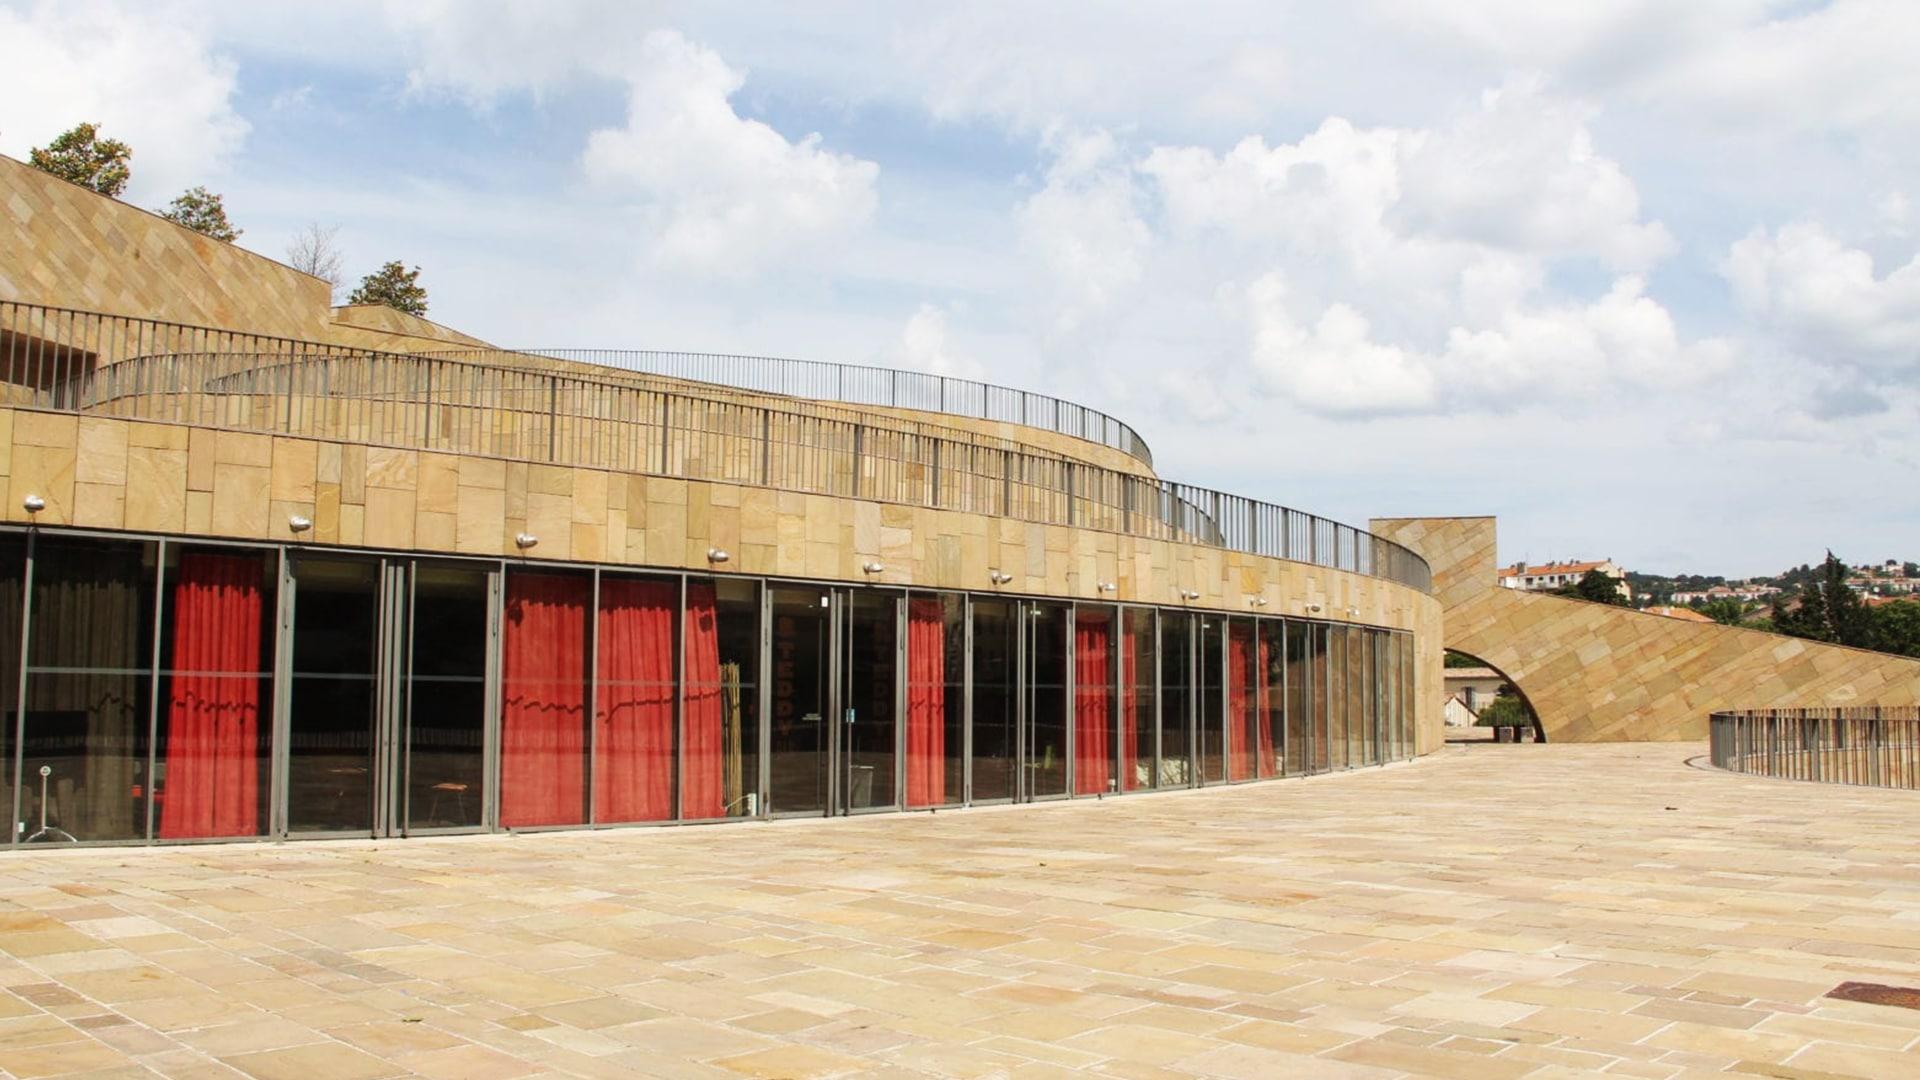 Visiter Aix-en-Provence : le Grand Théâtre de Provence